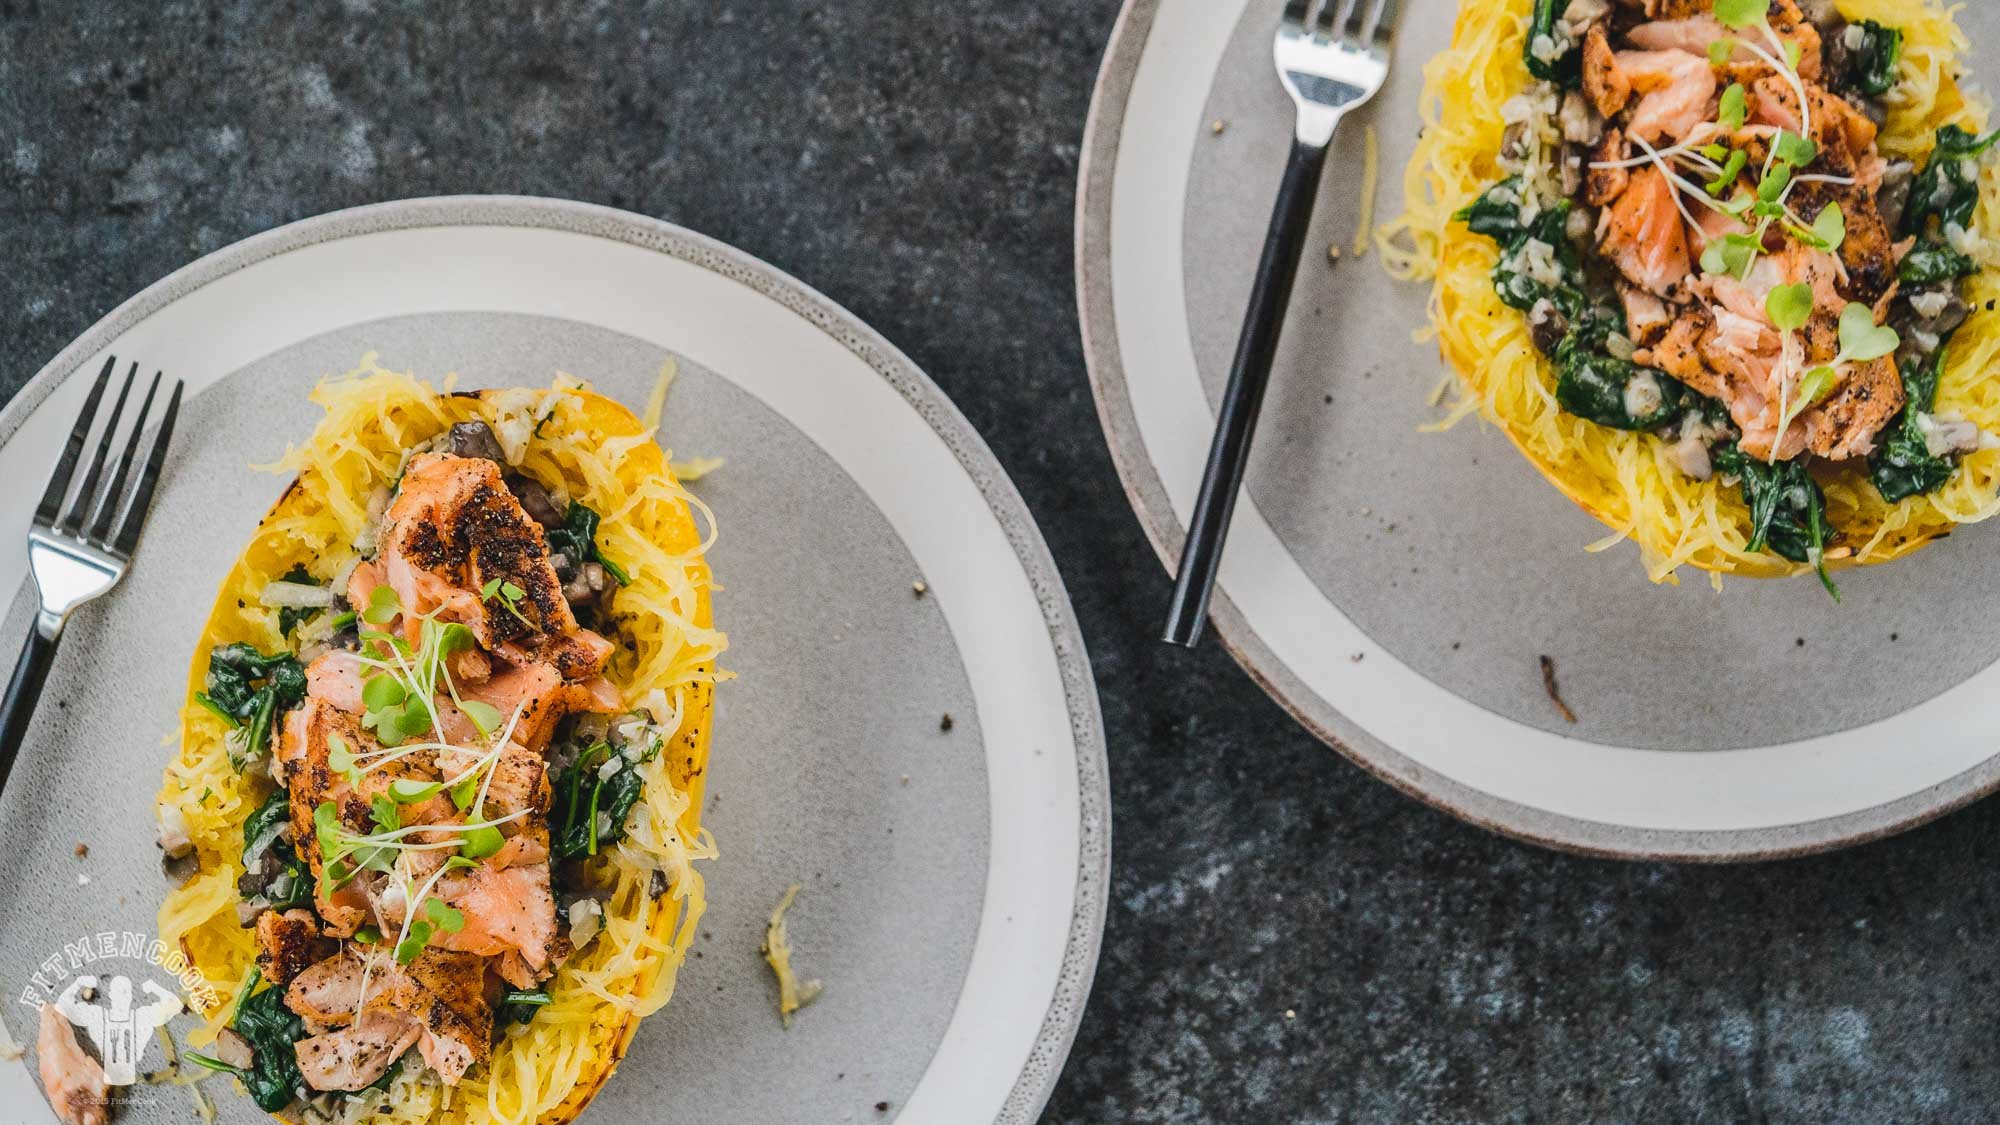 Creamy Salmon Pasta With Spicy Spaghetti Squash - Fit Men Cook